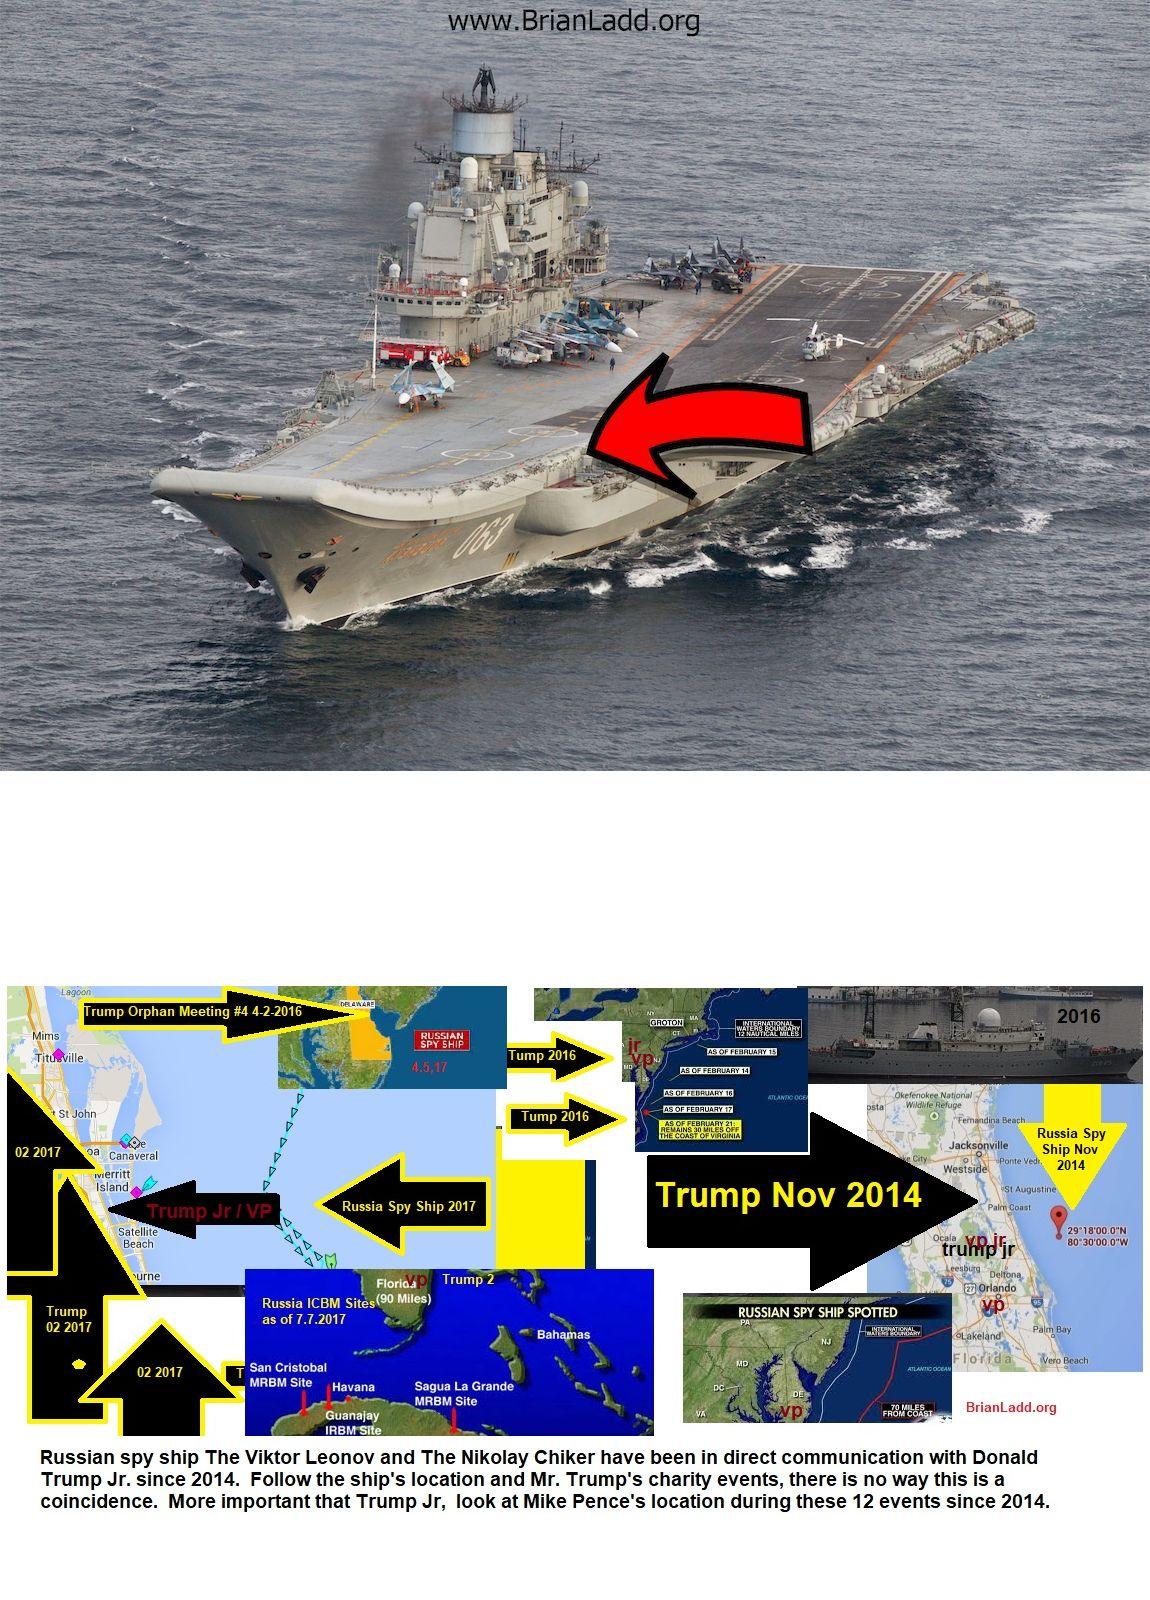 kuznetsov_261_russian_spy_ship_jamaica_Donald_Trump_Jr_Russian_Spy_Sub_and_Ship_2012_to_2017_map_R.jpg